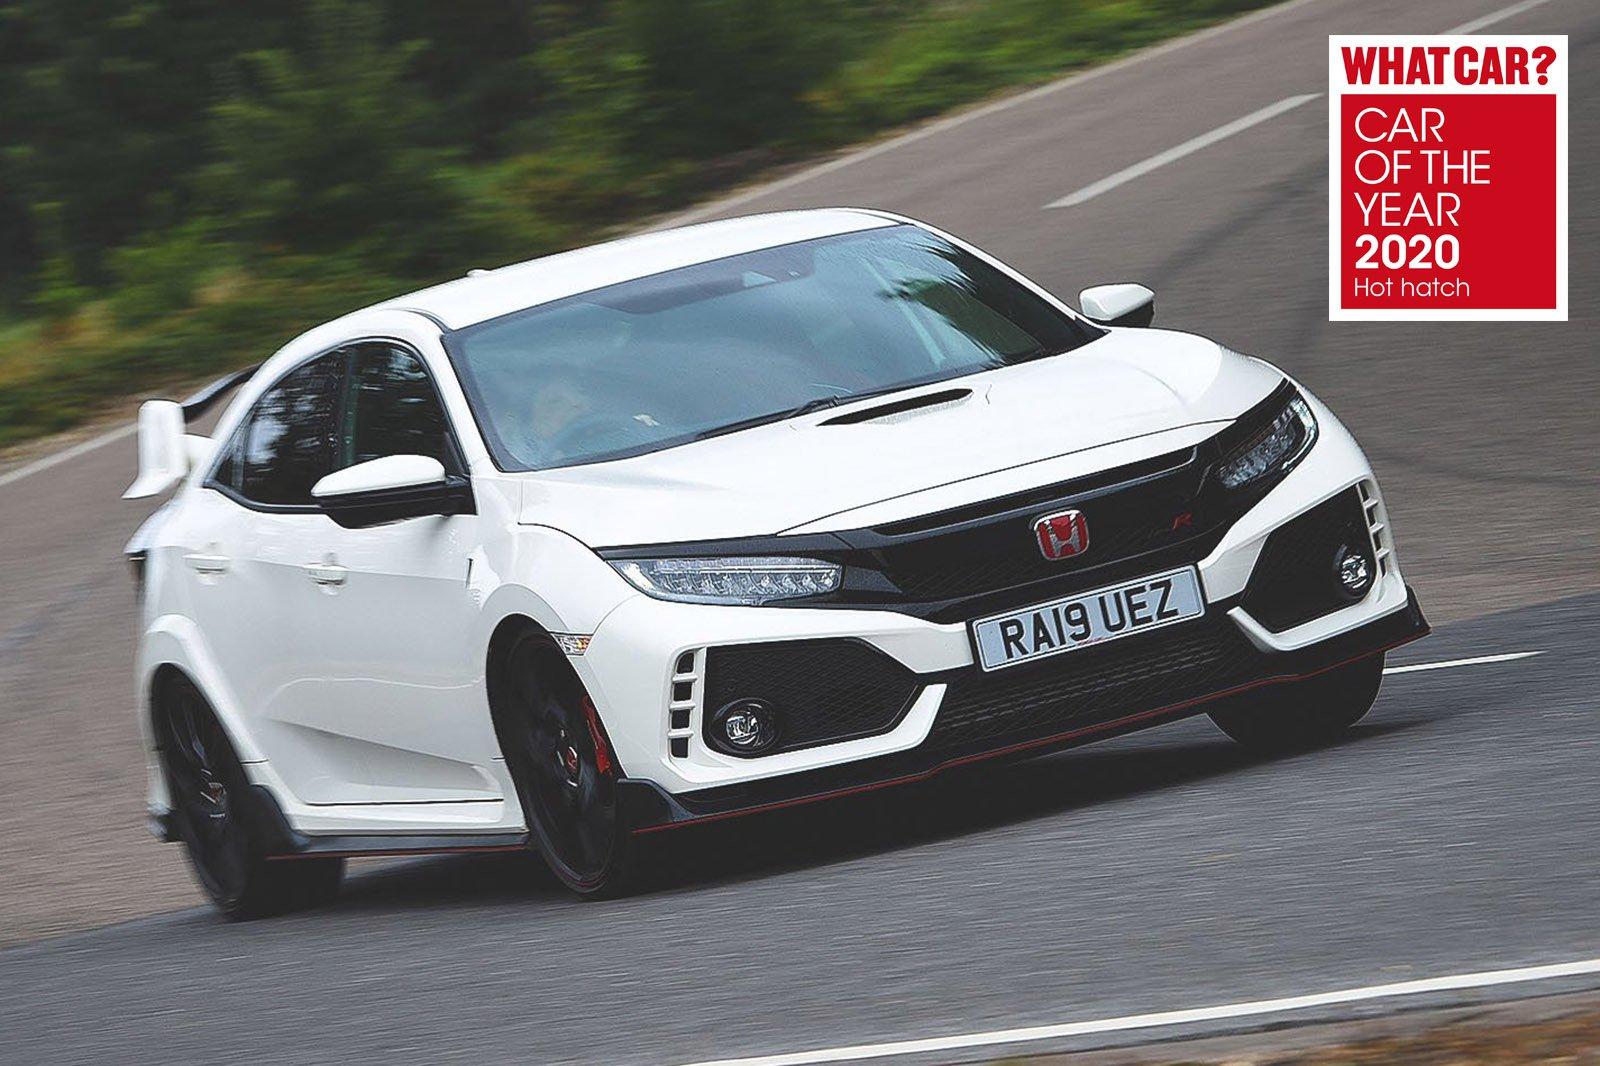 Honda Civic Type R with What Car? Awards logo